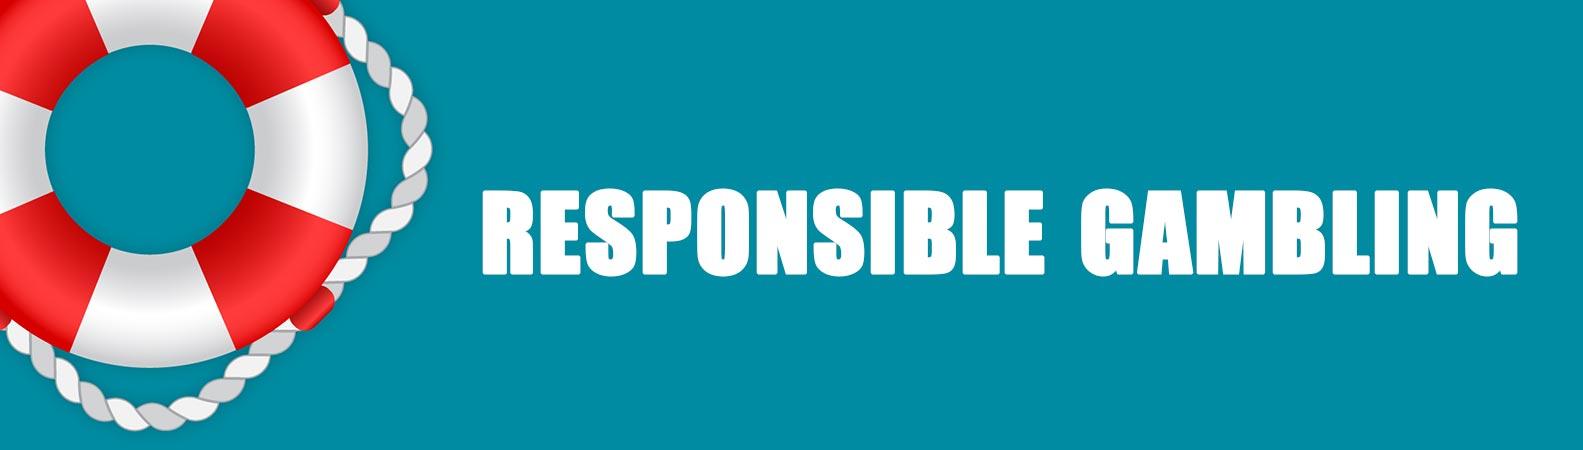 atsakingas lošimas - responsible gambling - gelbėjimo ratas